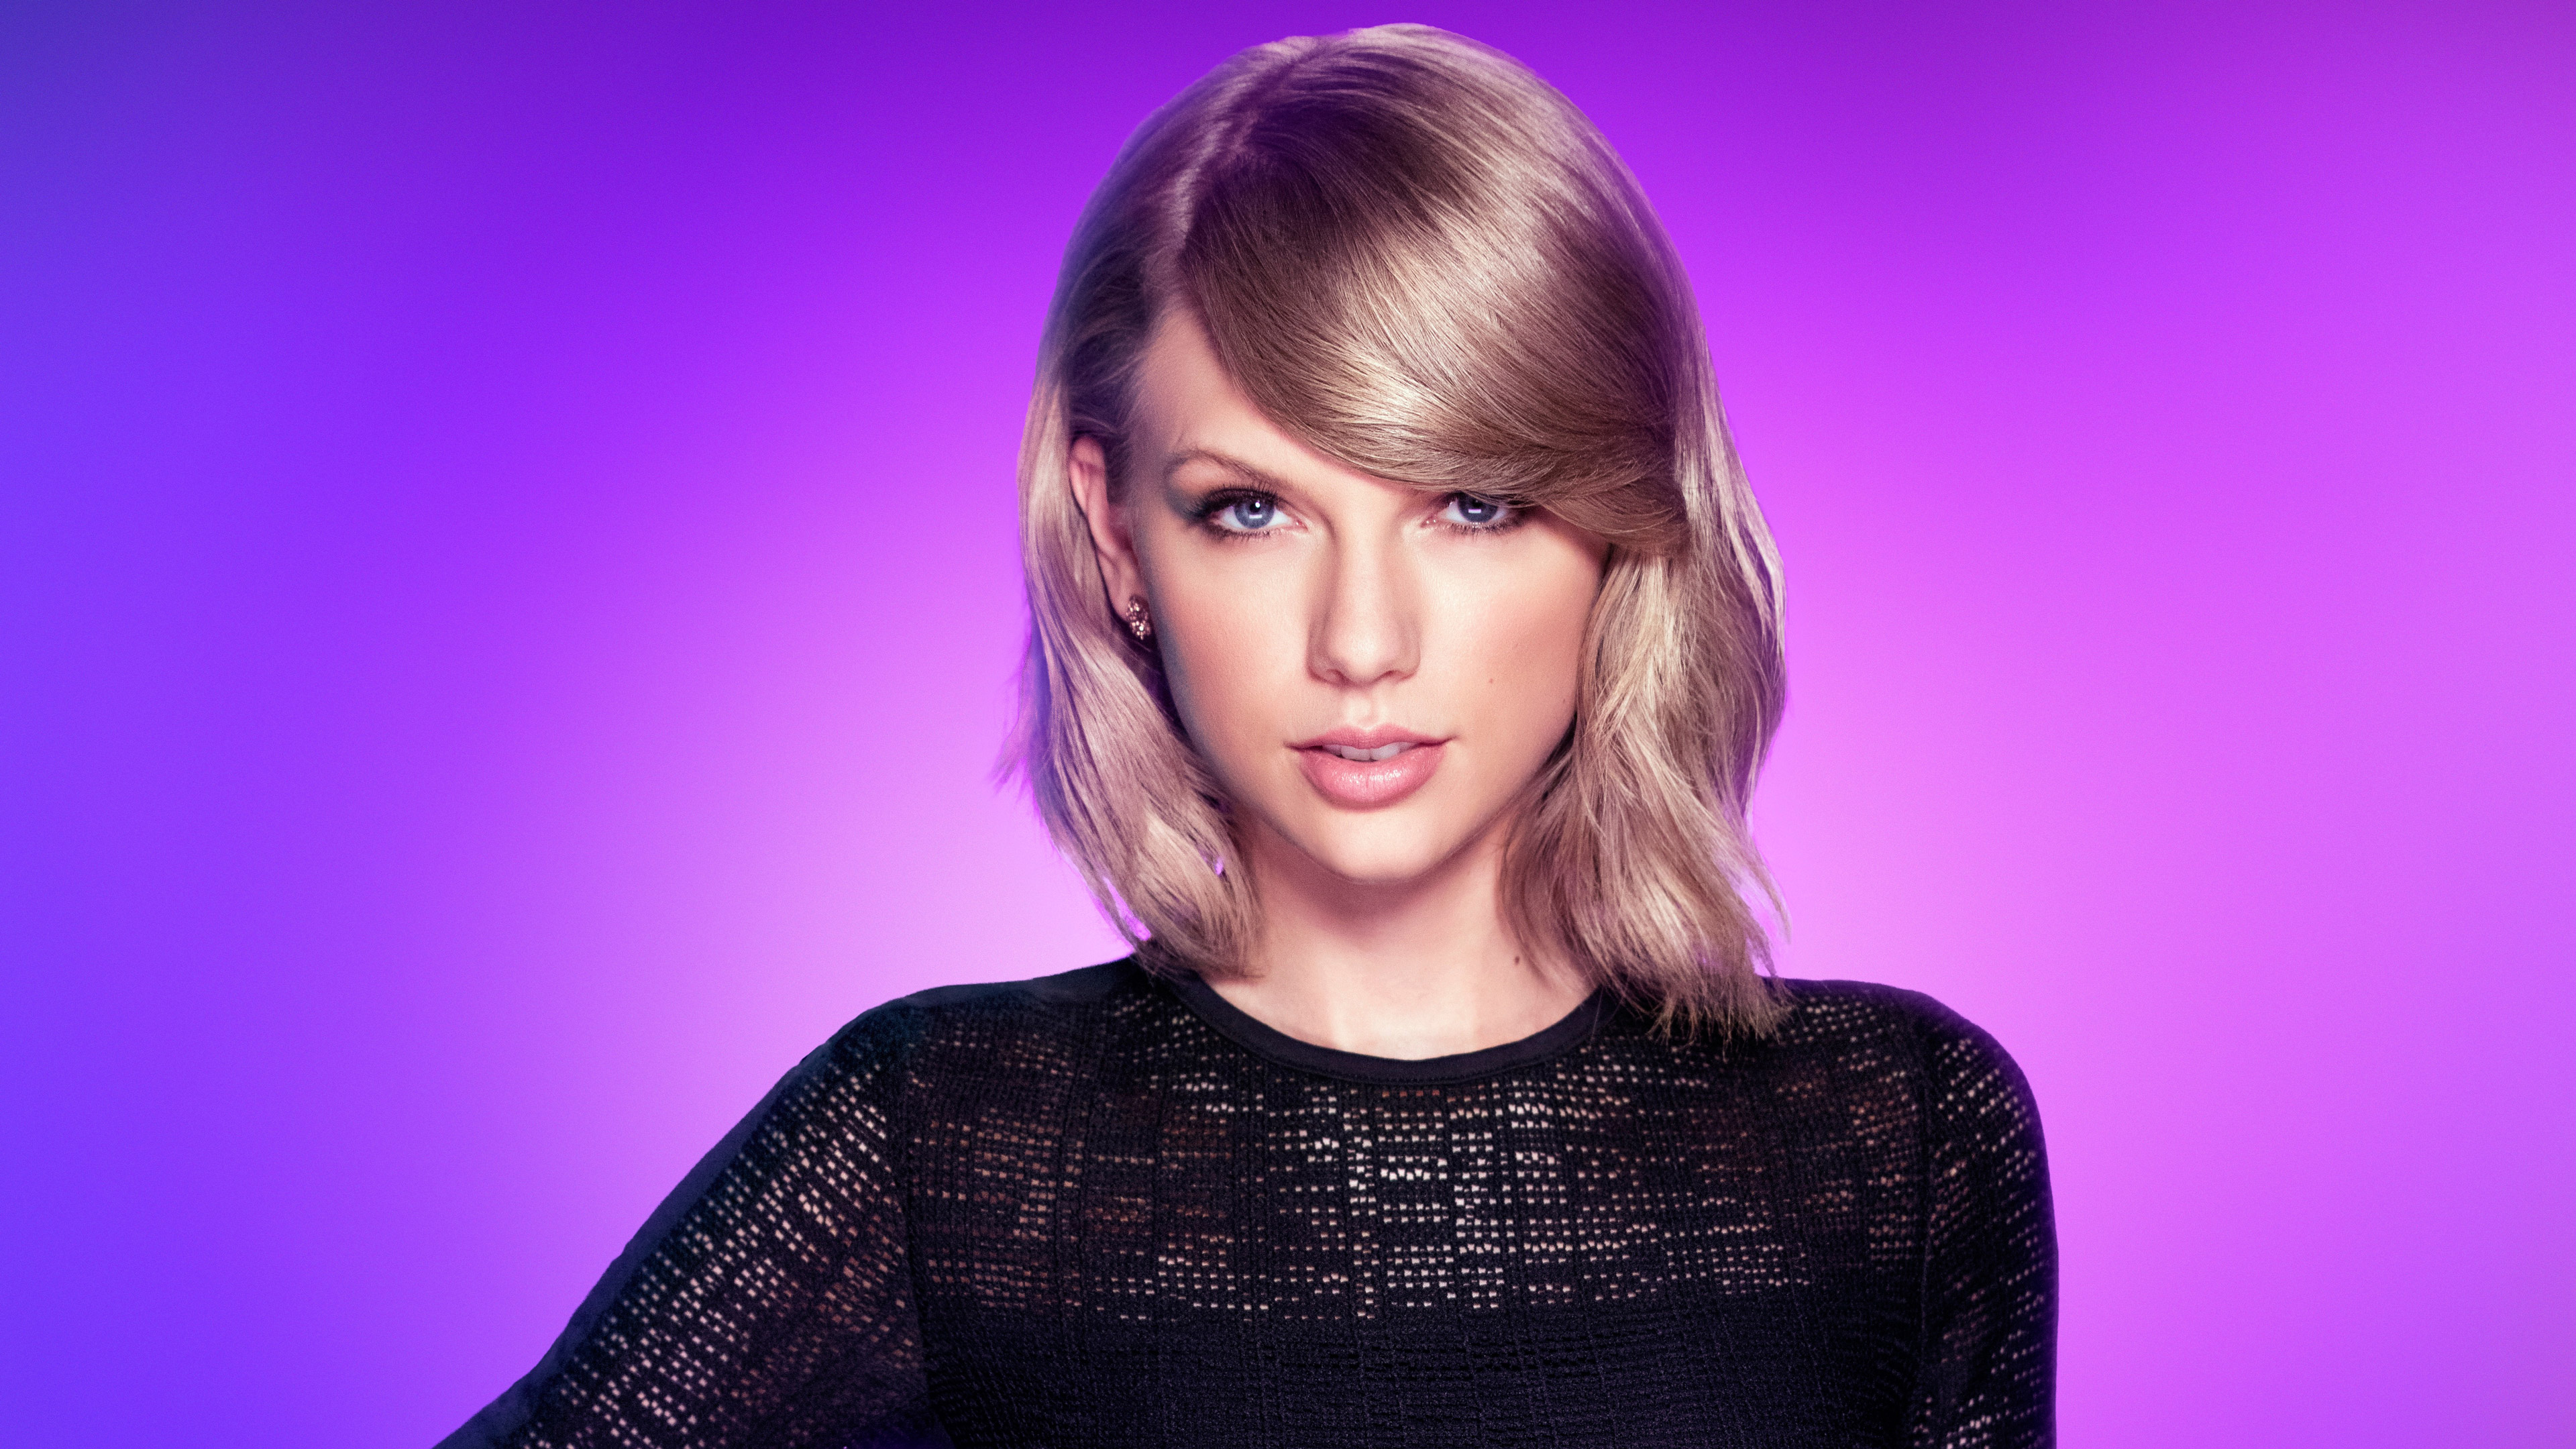 taylor swift 4k 1536857138 - Taylor Swift 4k - taylor swift wallpapers, singer wallpapers, music wallpapers, celebrities wallpapers, 4k-wallpapers